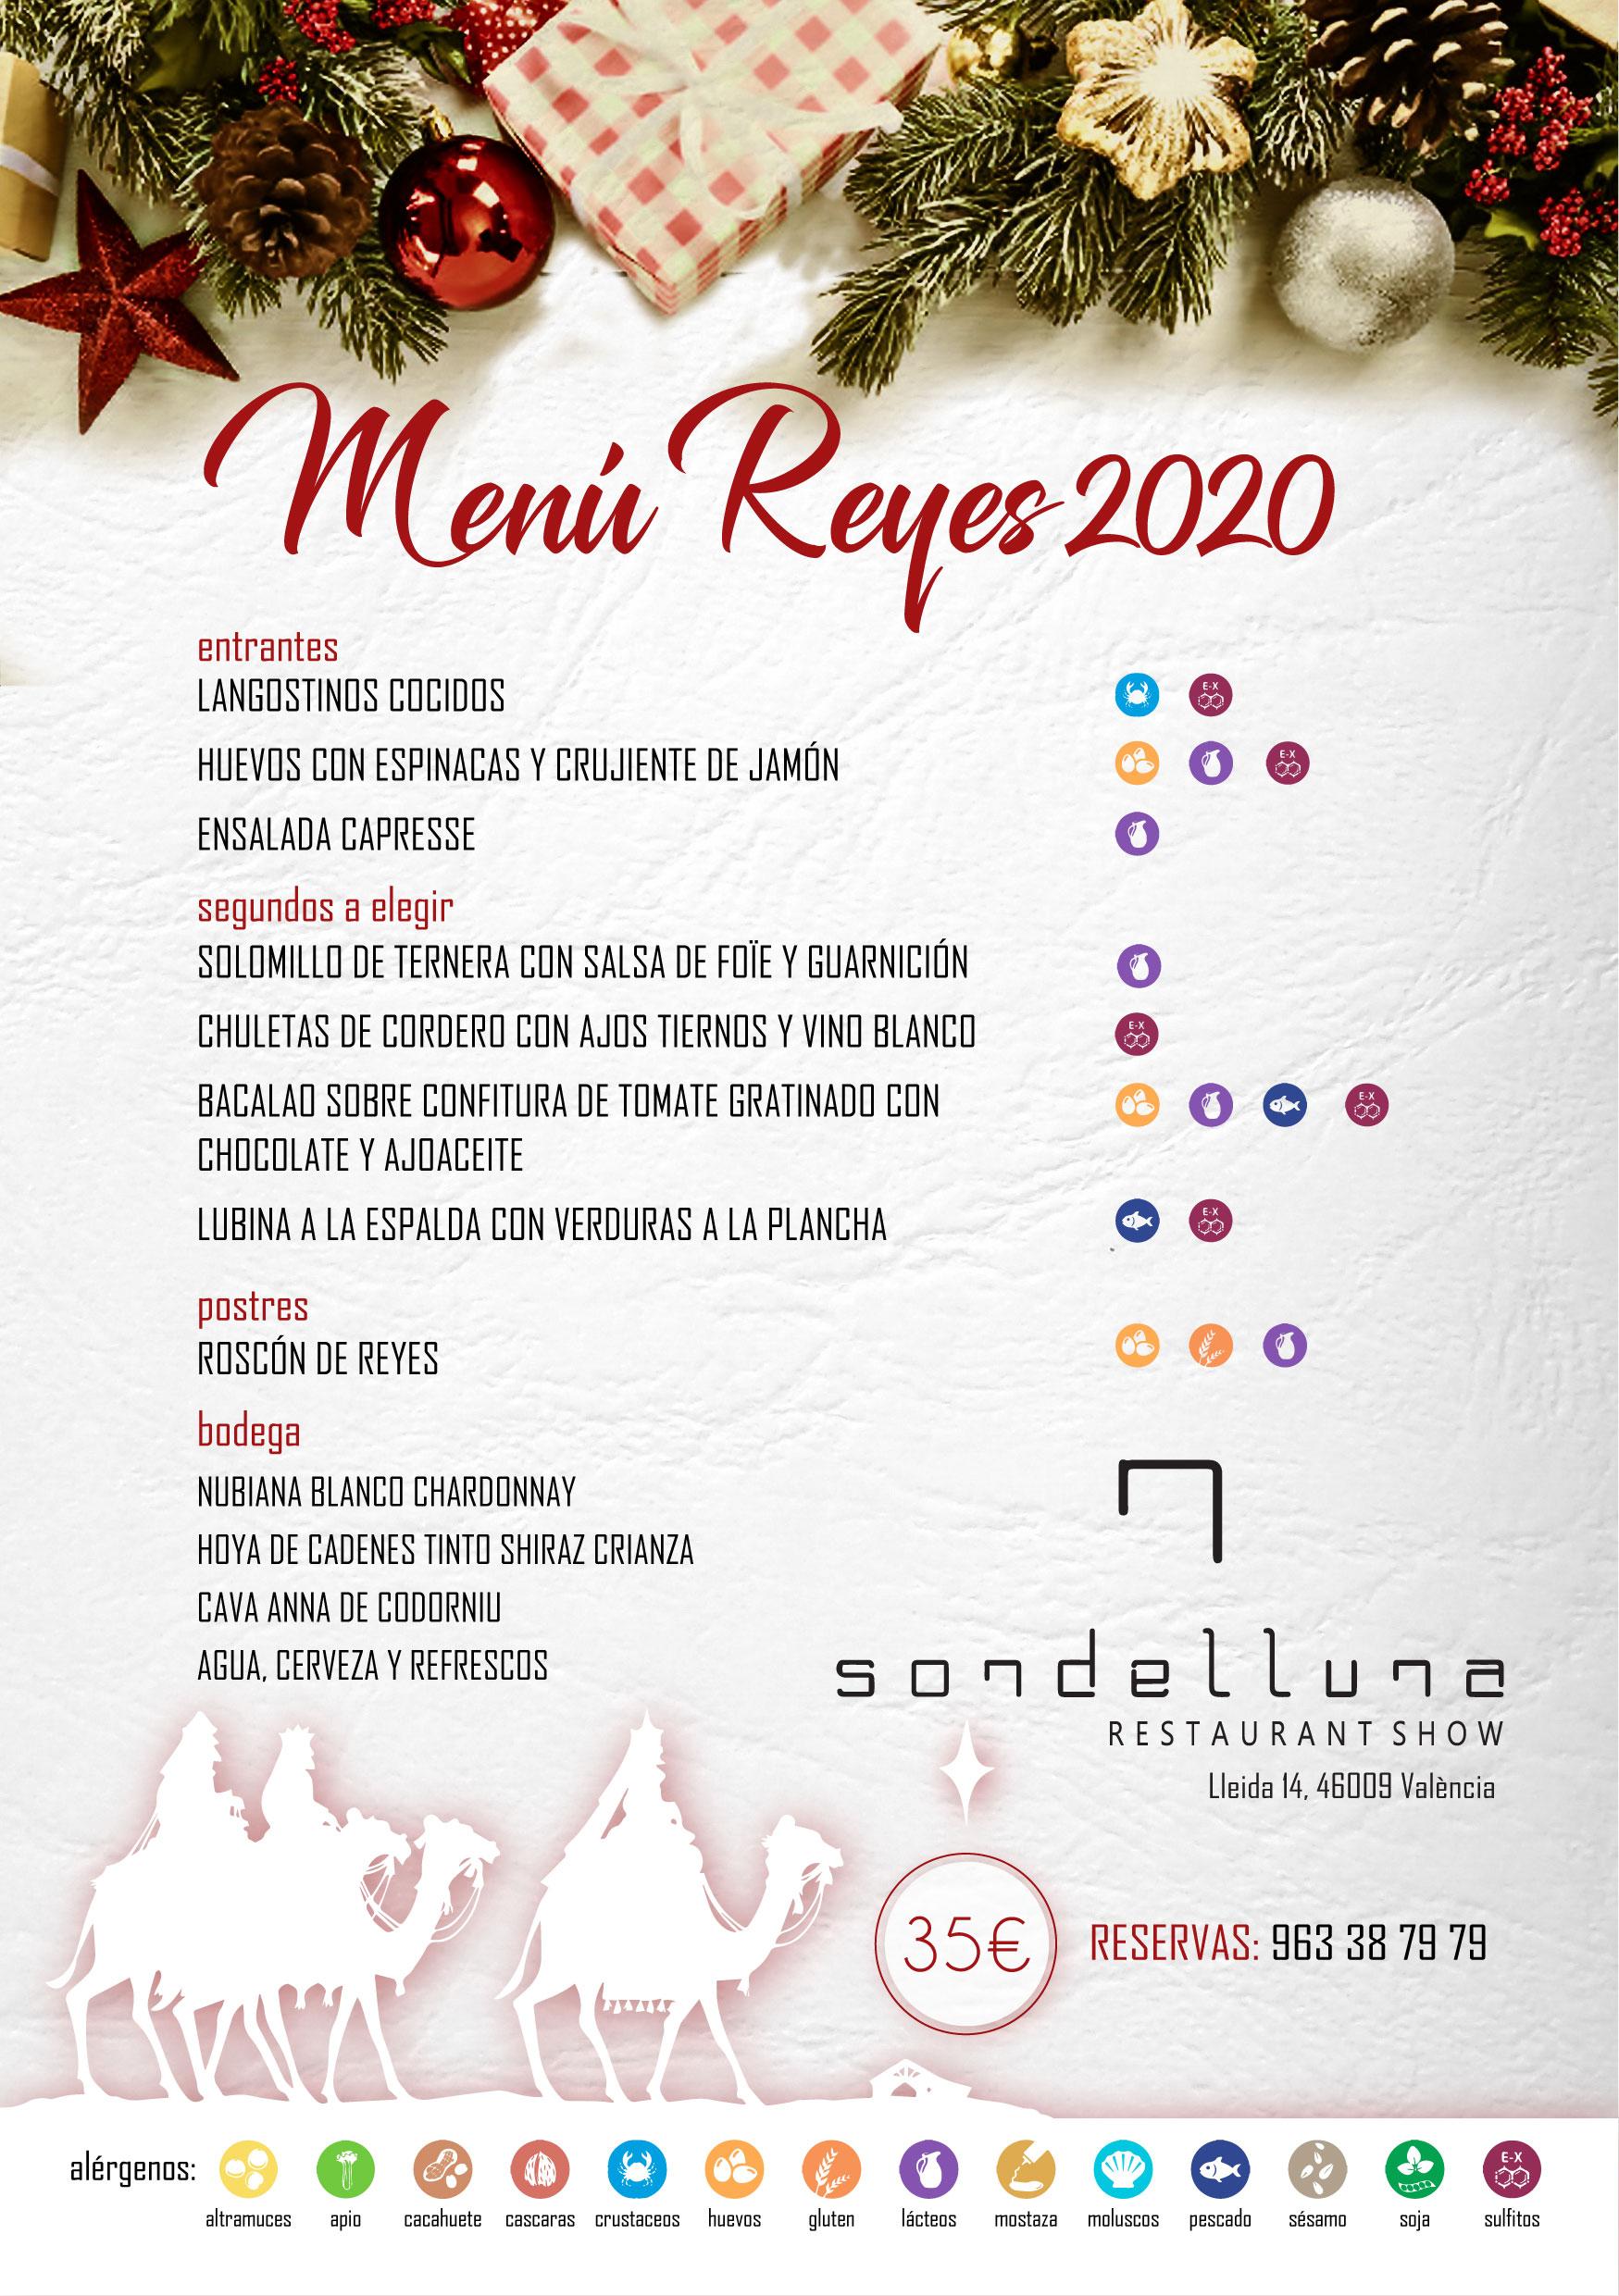 reyes35-2020-sondelluna